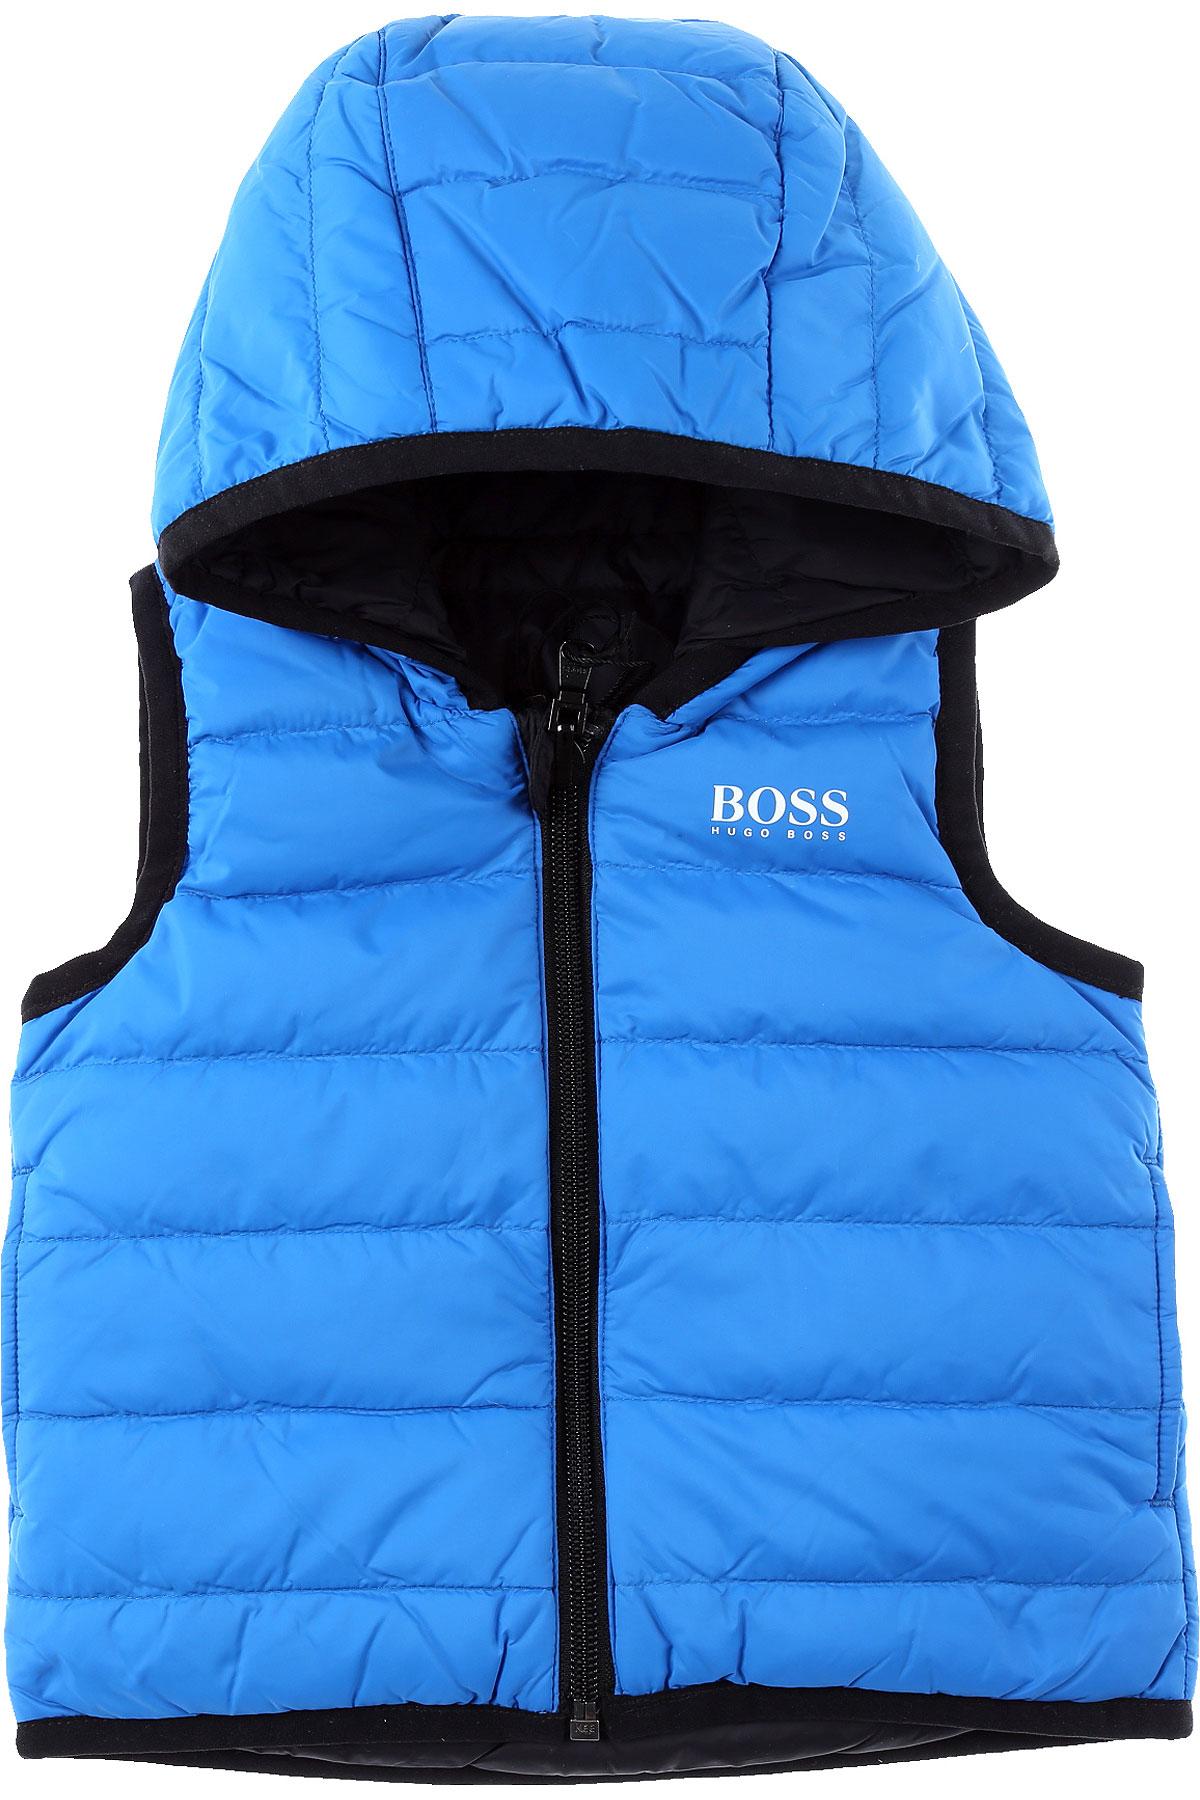 Hugo Boss Baby Down Jacket for Boys On Sale, Blue, polyamide, 2019, 2Y 3Y 9M